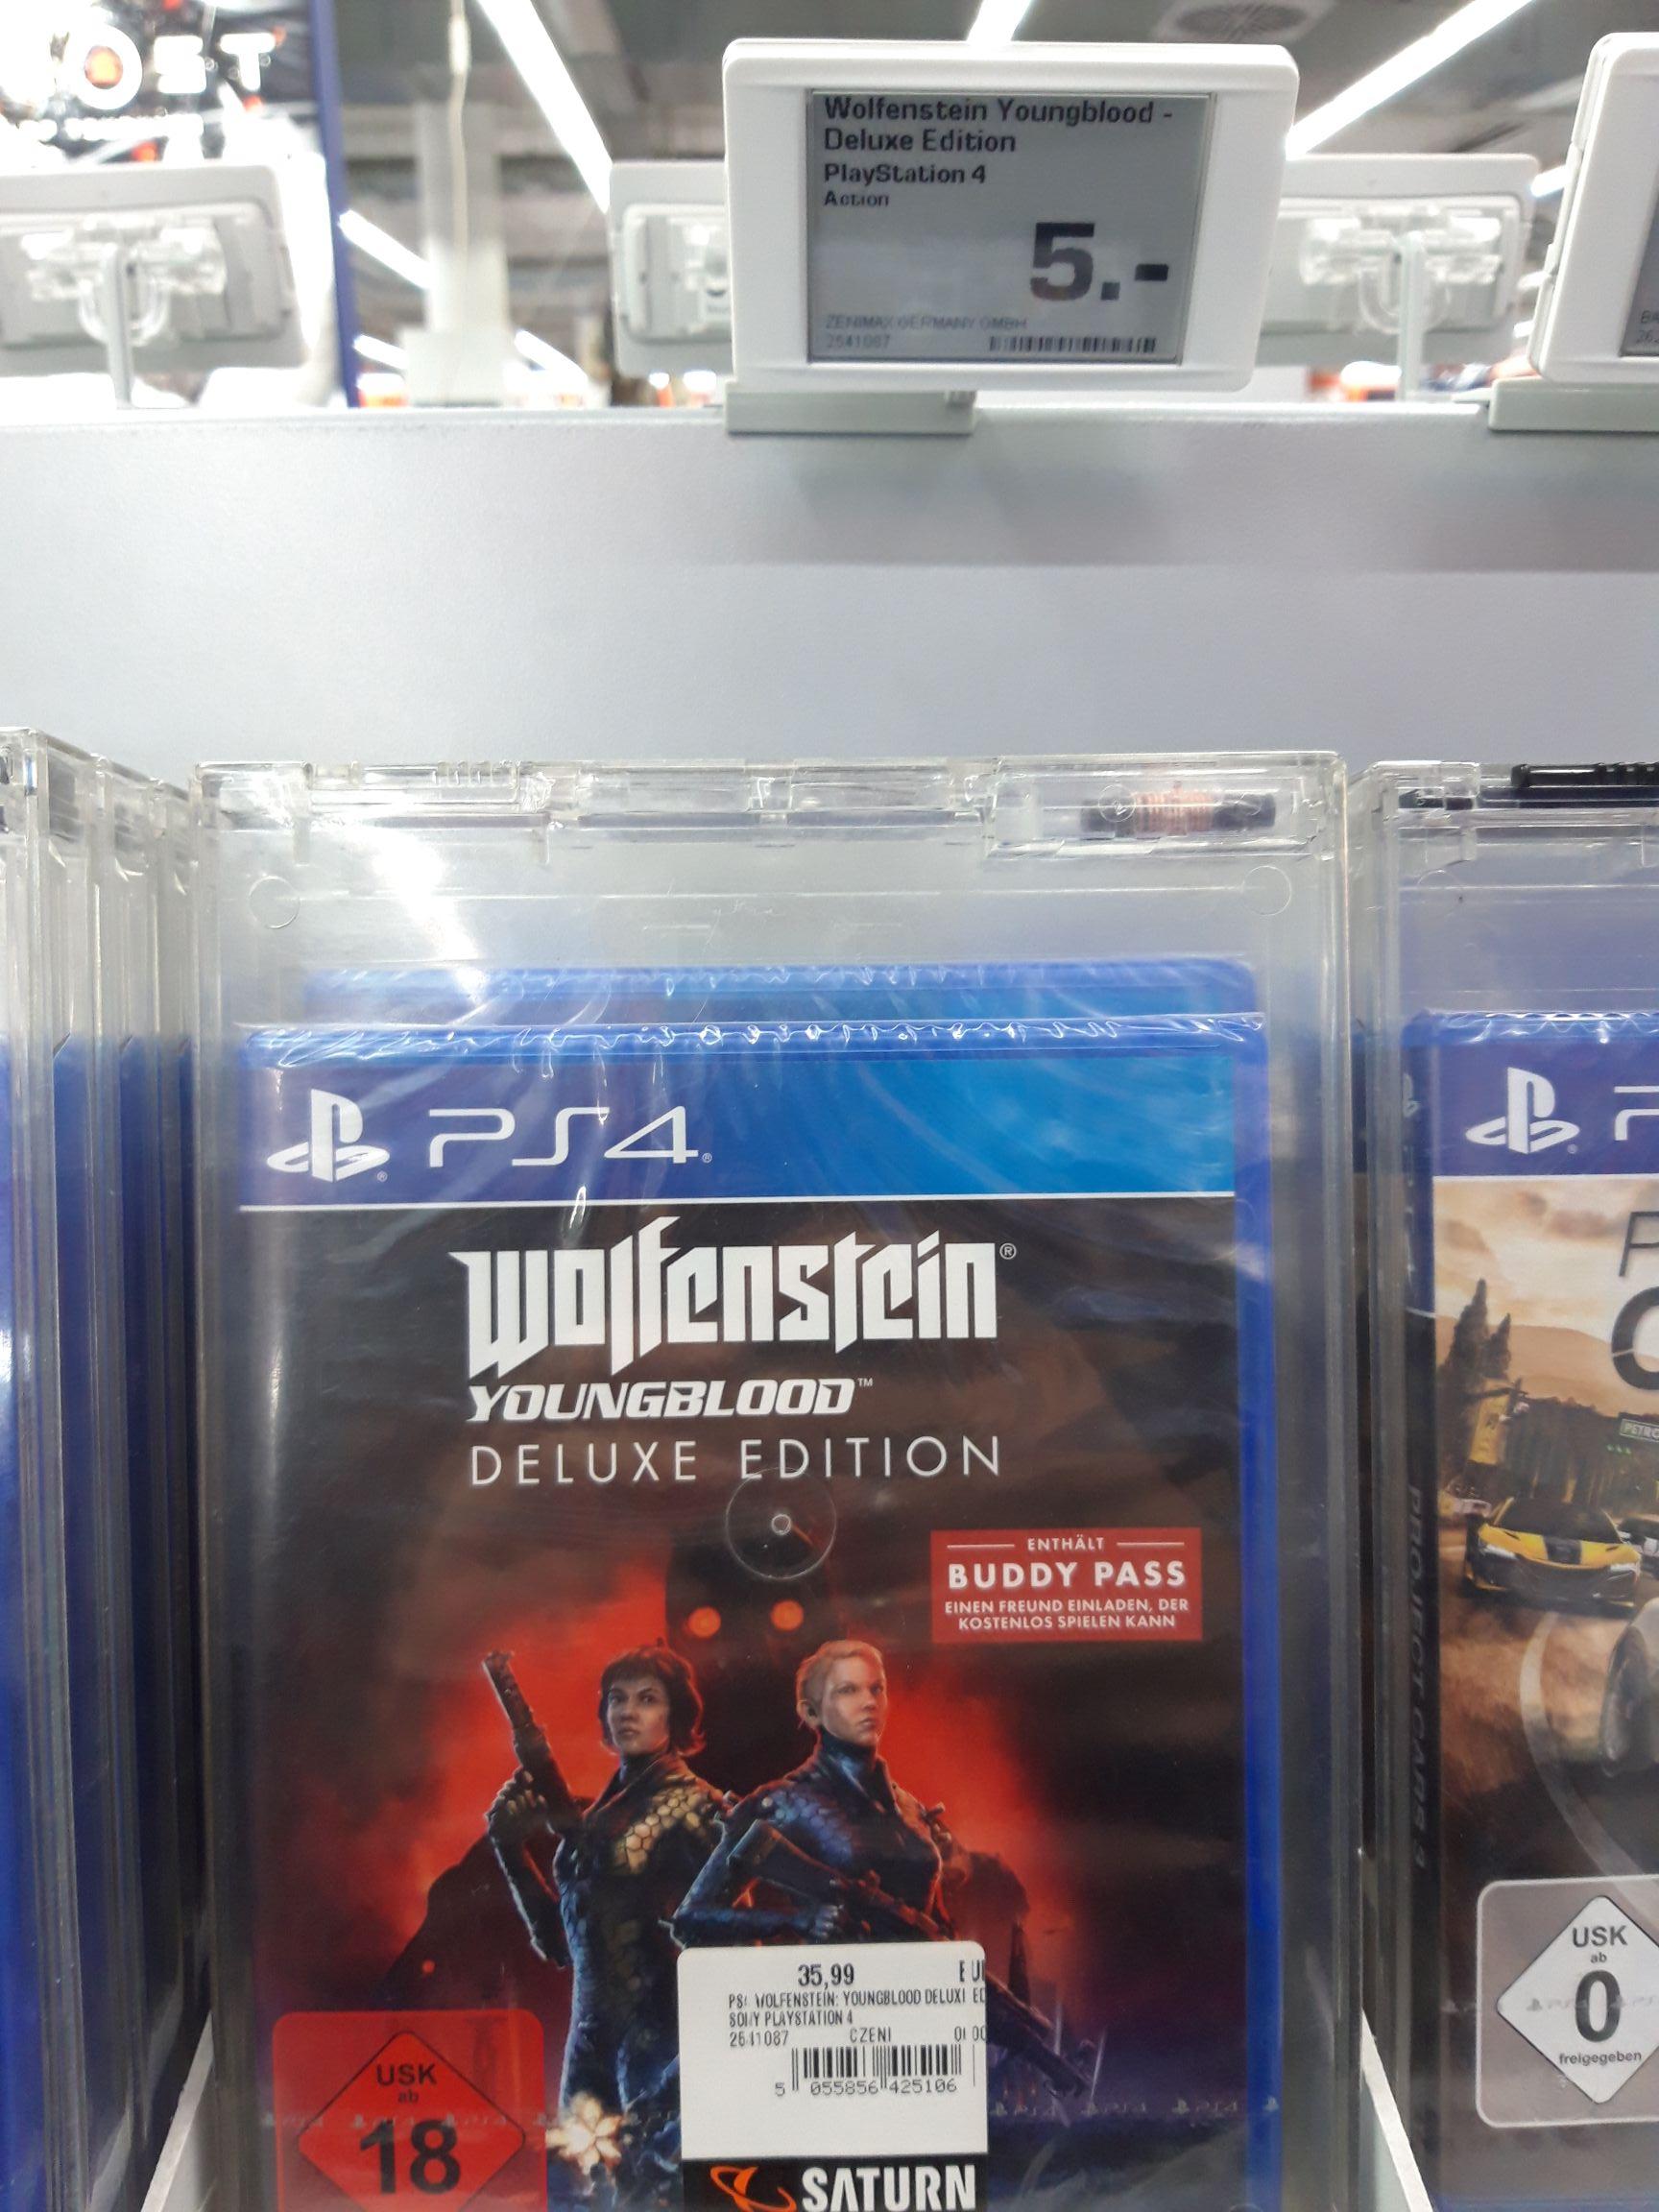 Lokal Saturn Wuppertal - Wolfenstein Youngblood Deluxe Edition für PS4